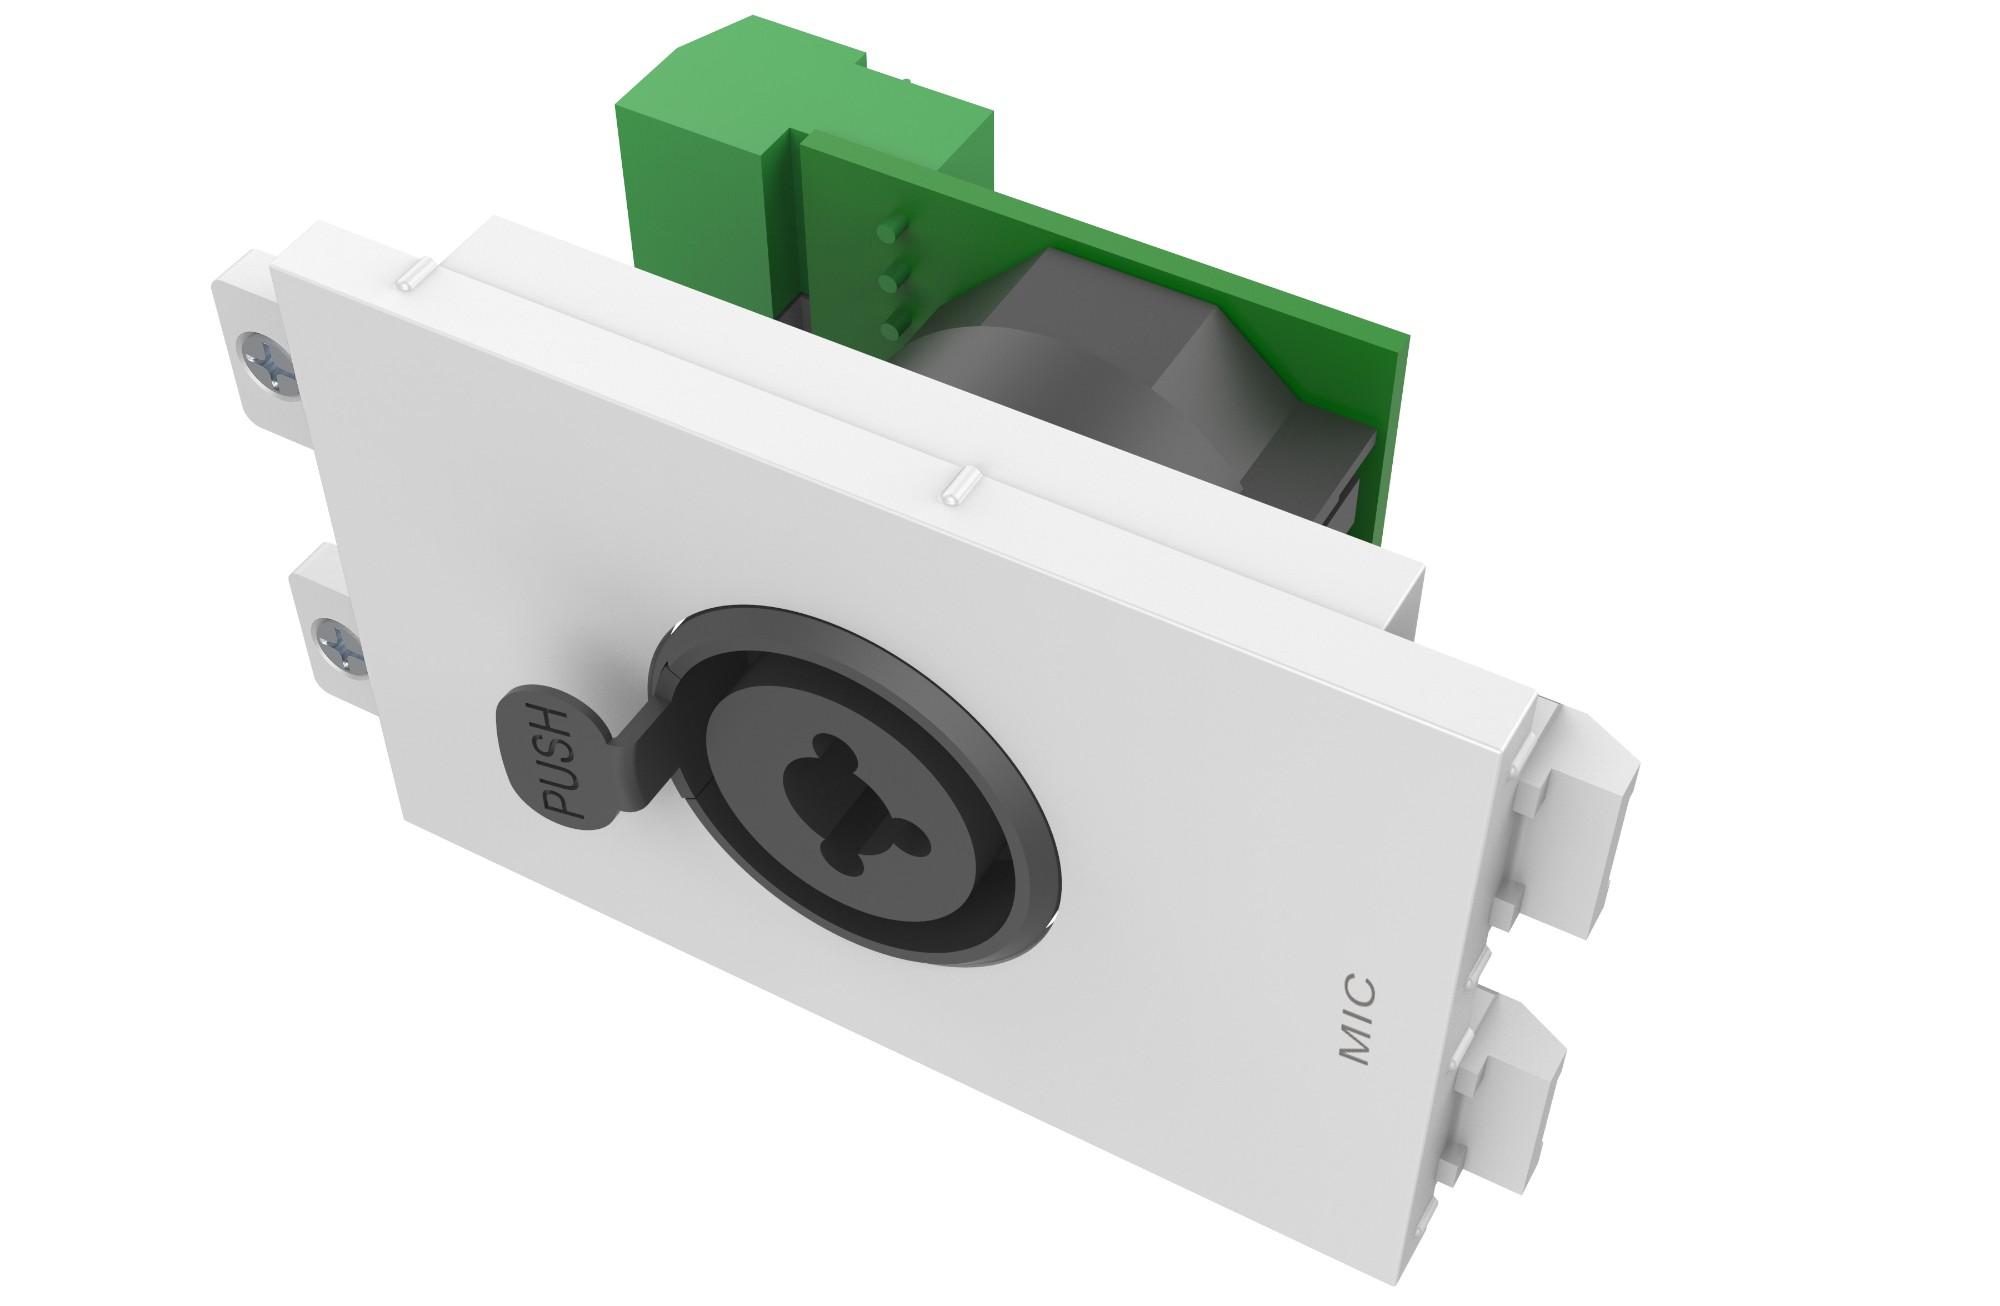 Vision Tc3 Xlrfjack Xlr 6 35mm White Socket Outlet